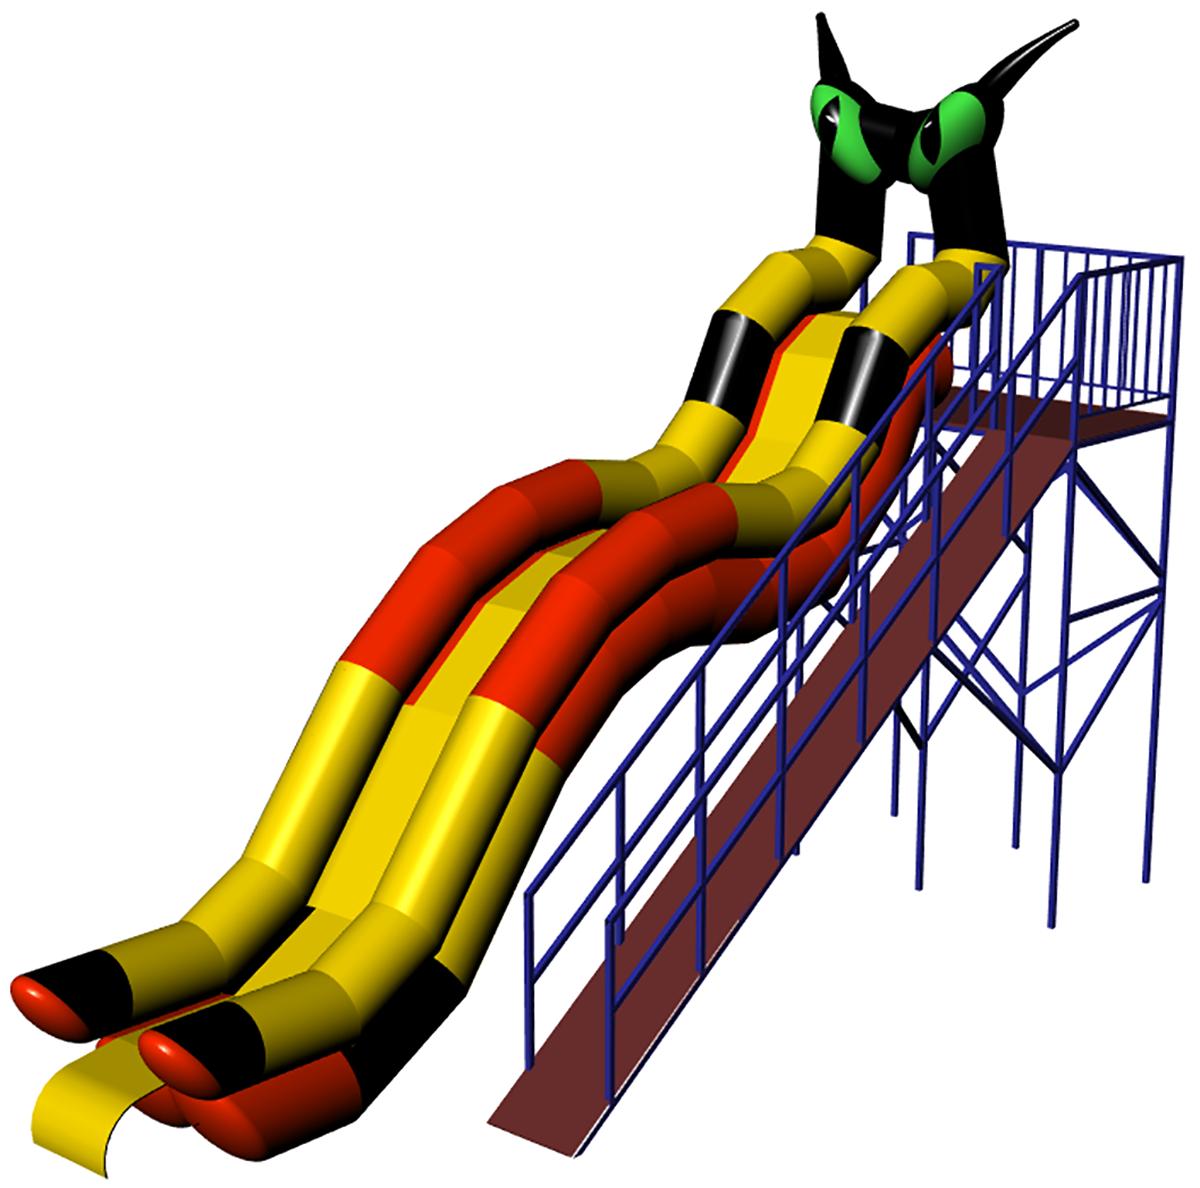 Inflatable water slide KOT-4